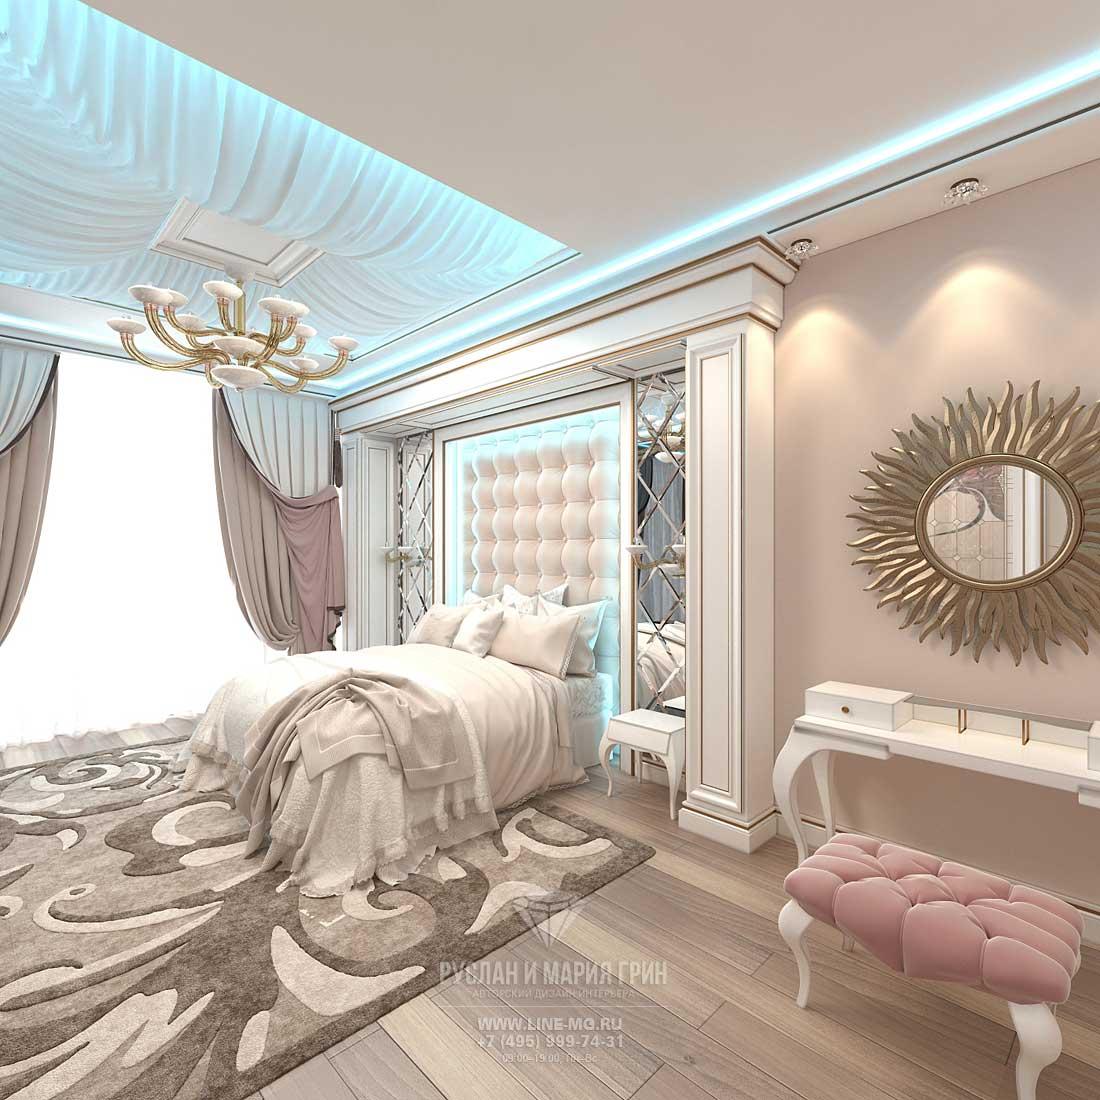 Дизайн спальни в бежевых тонах. Квартира в ЖК «Сколково Парк»